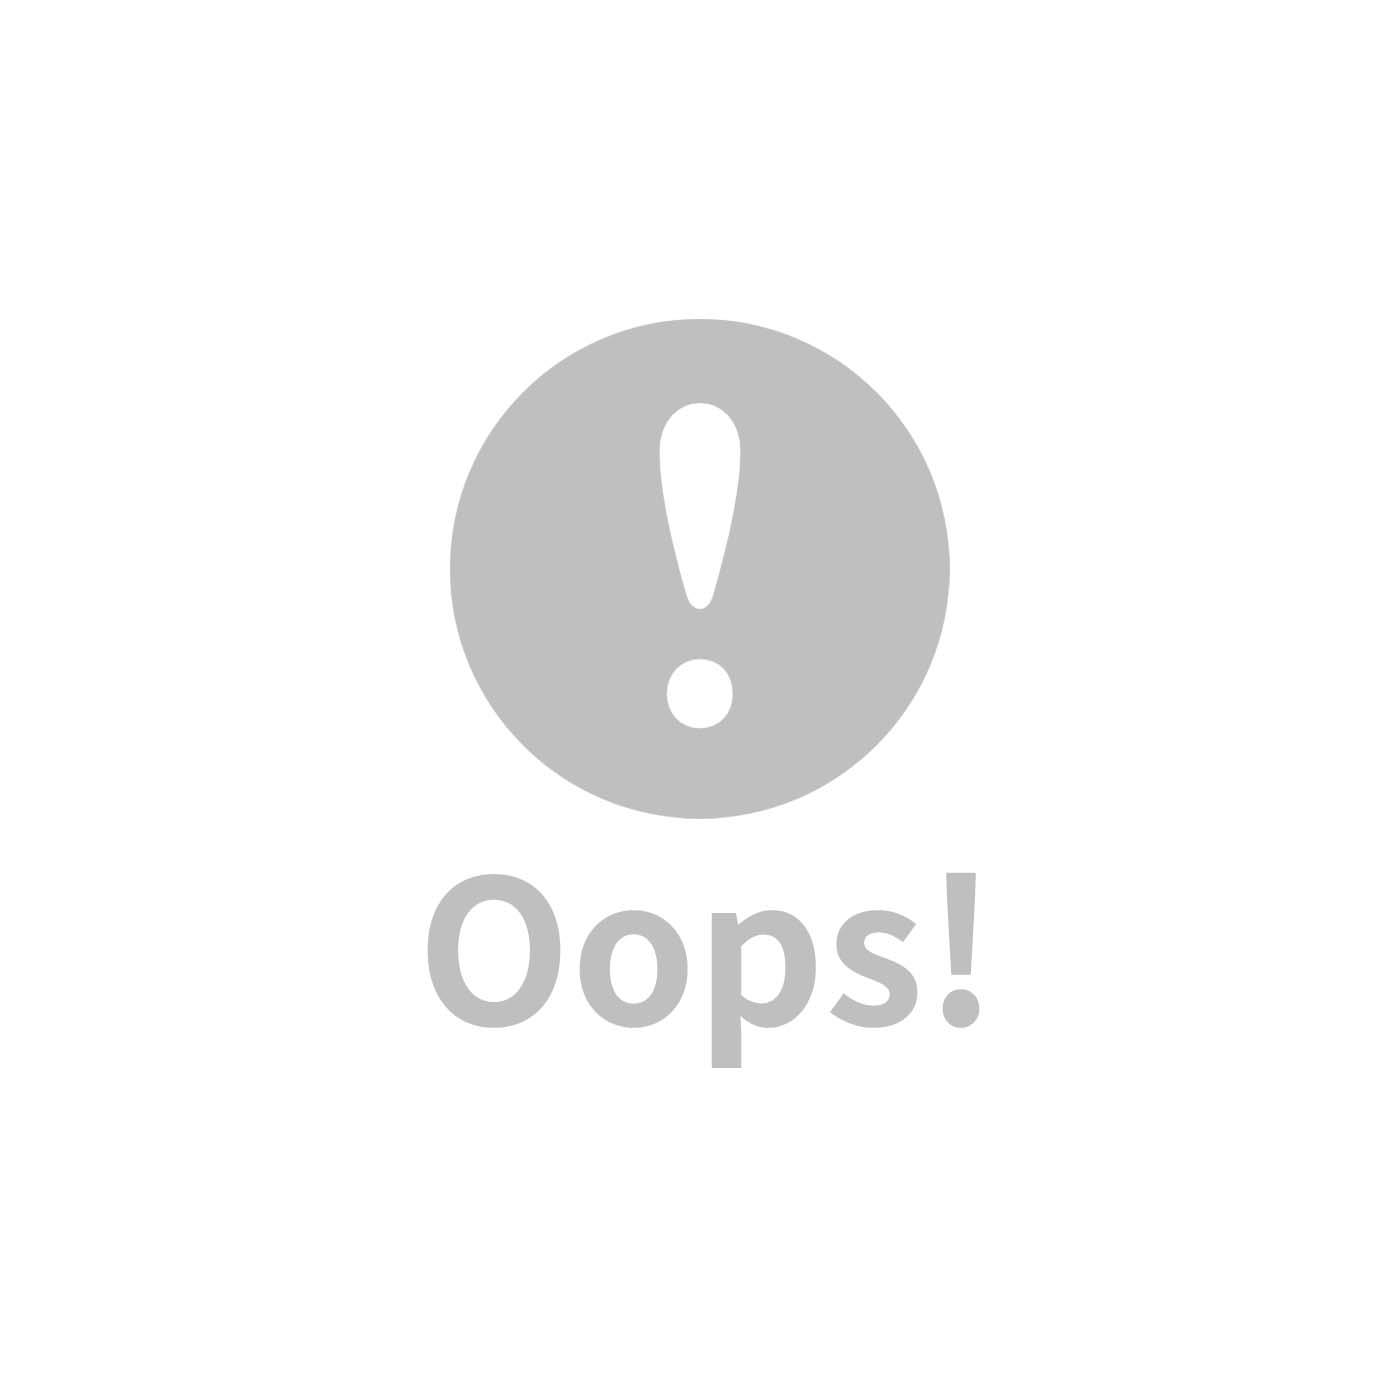 global affairs 童話手工編織安撫奶嘴夾_海洋系列(螃蟹大兵)